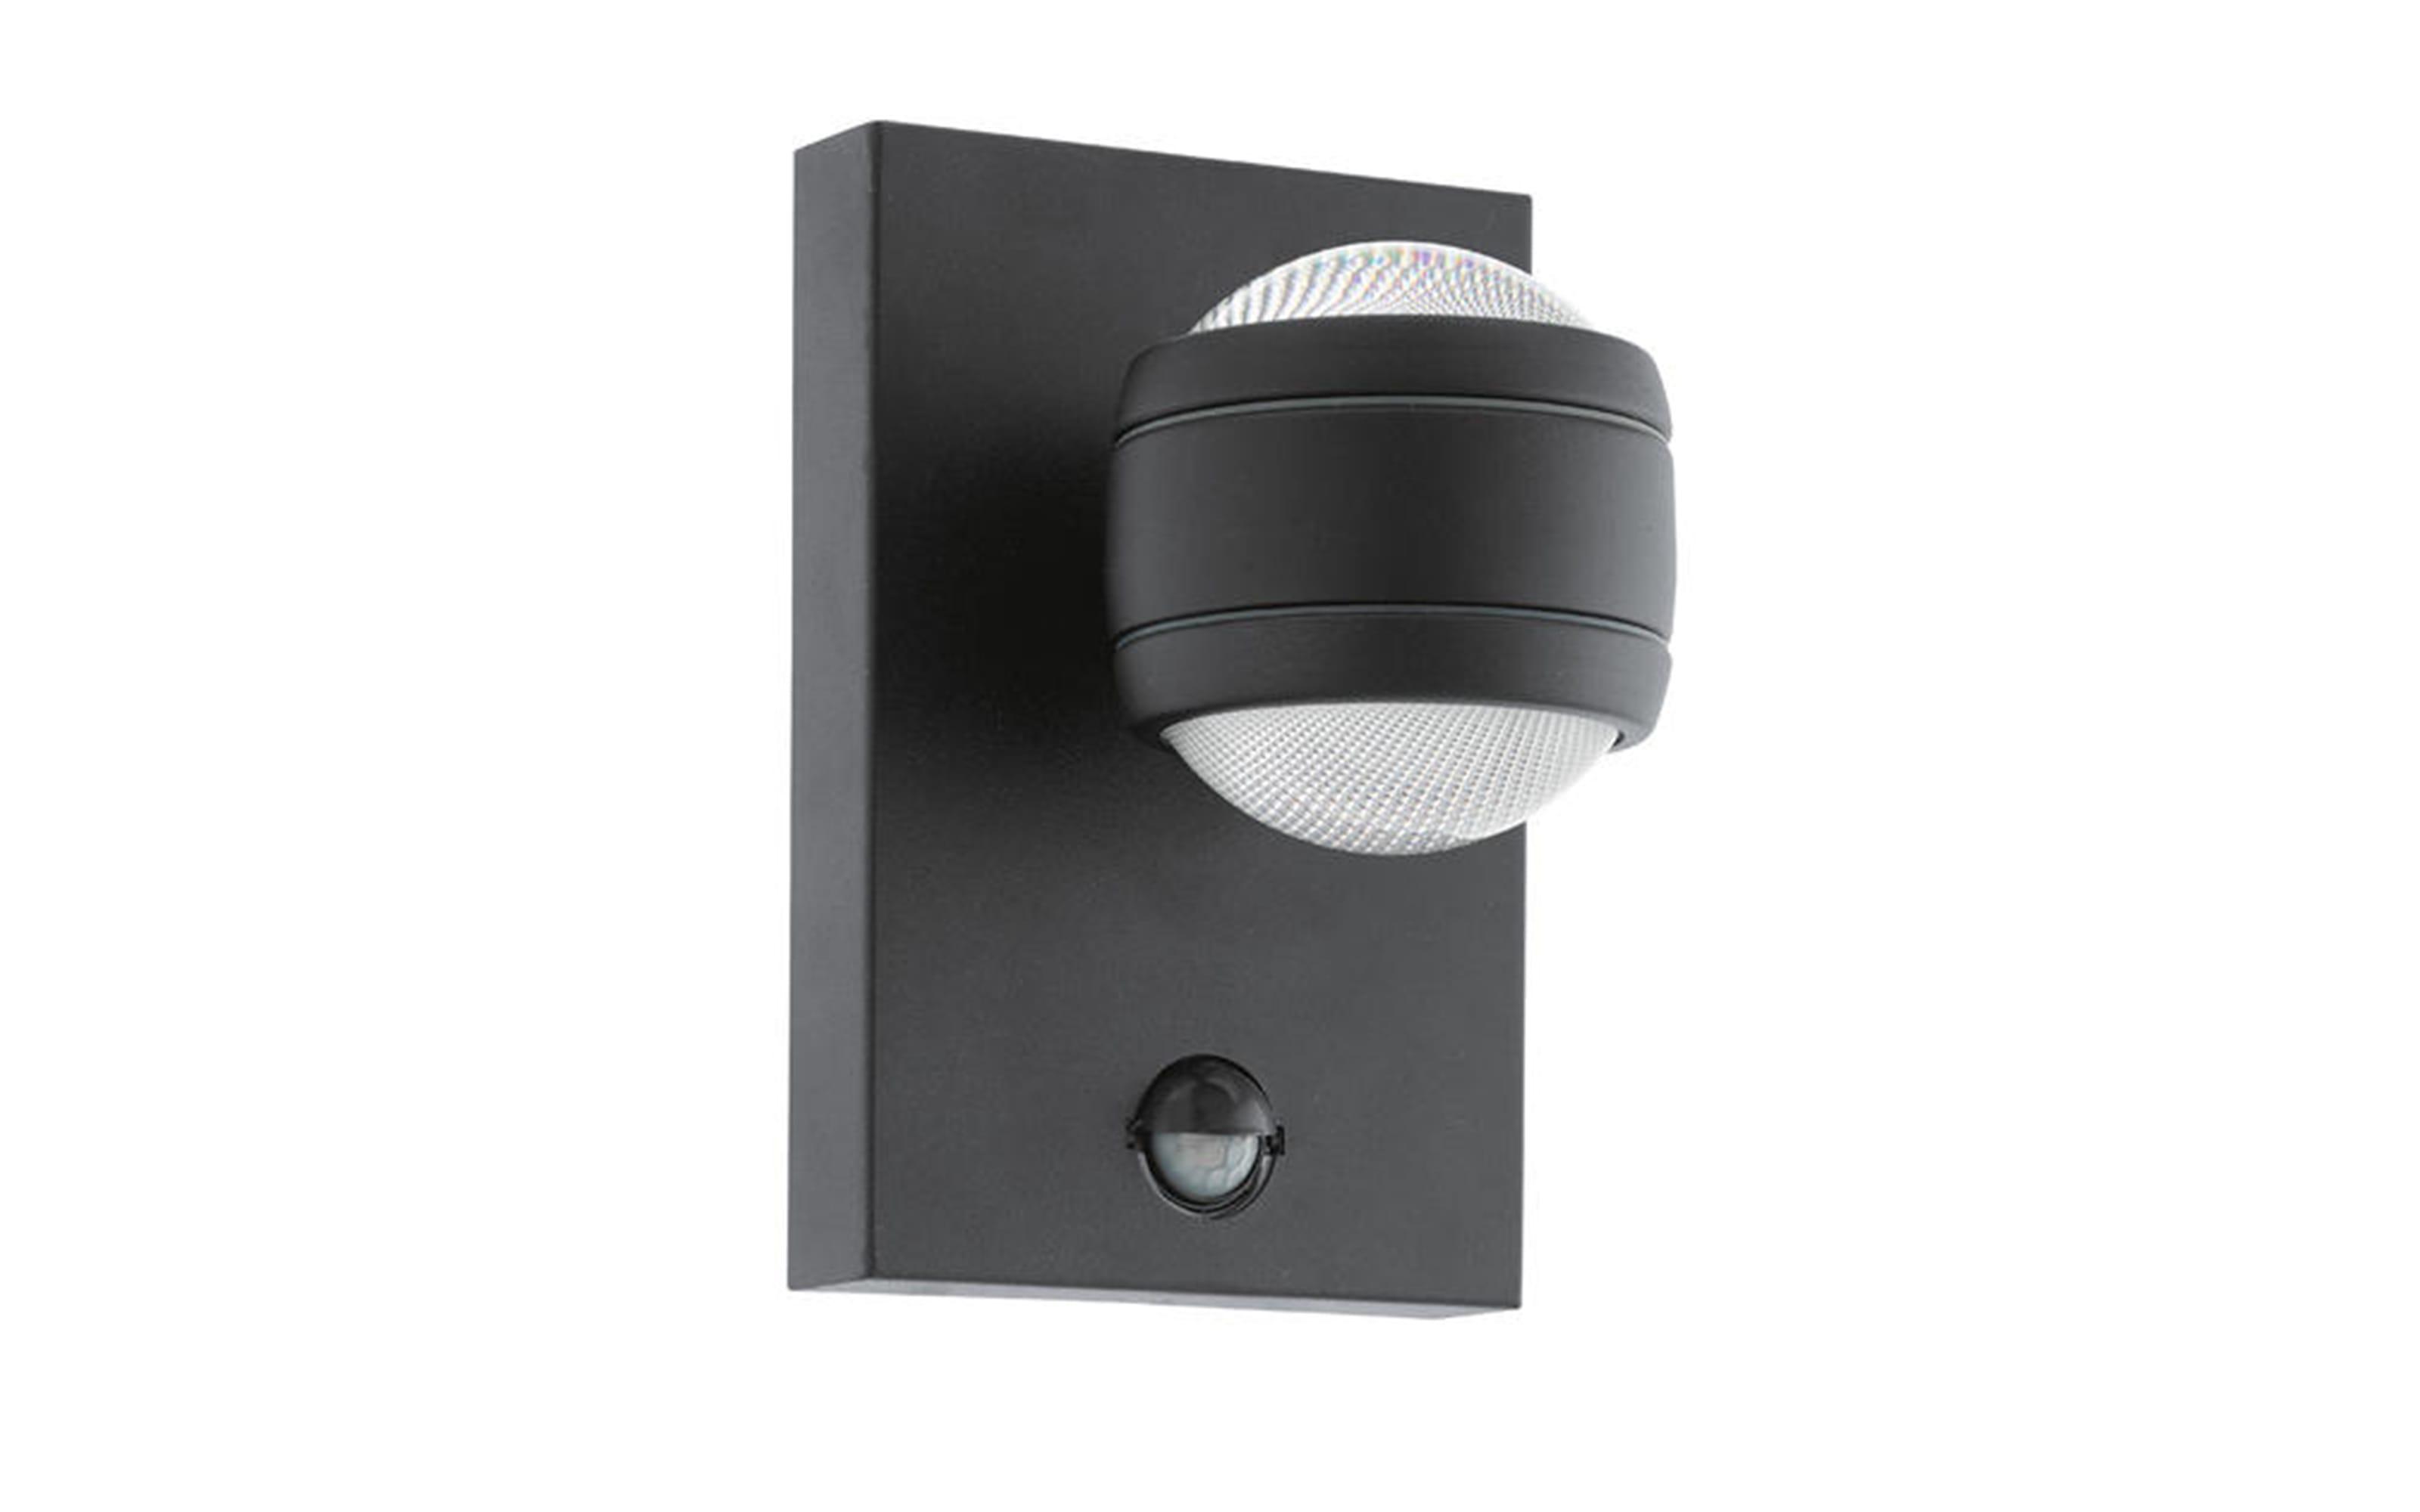 LED-Außenwandleuchte Sesimba 1 in schwarz